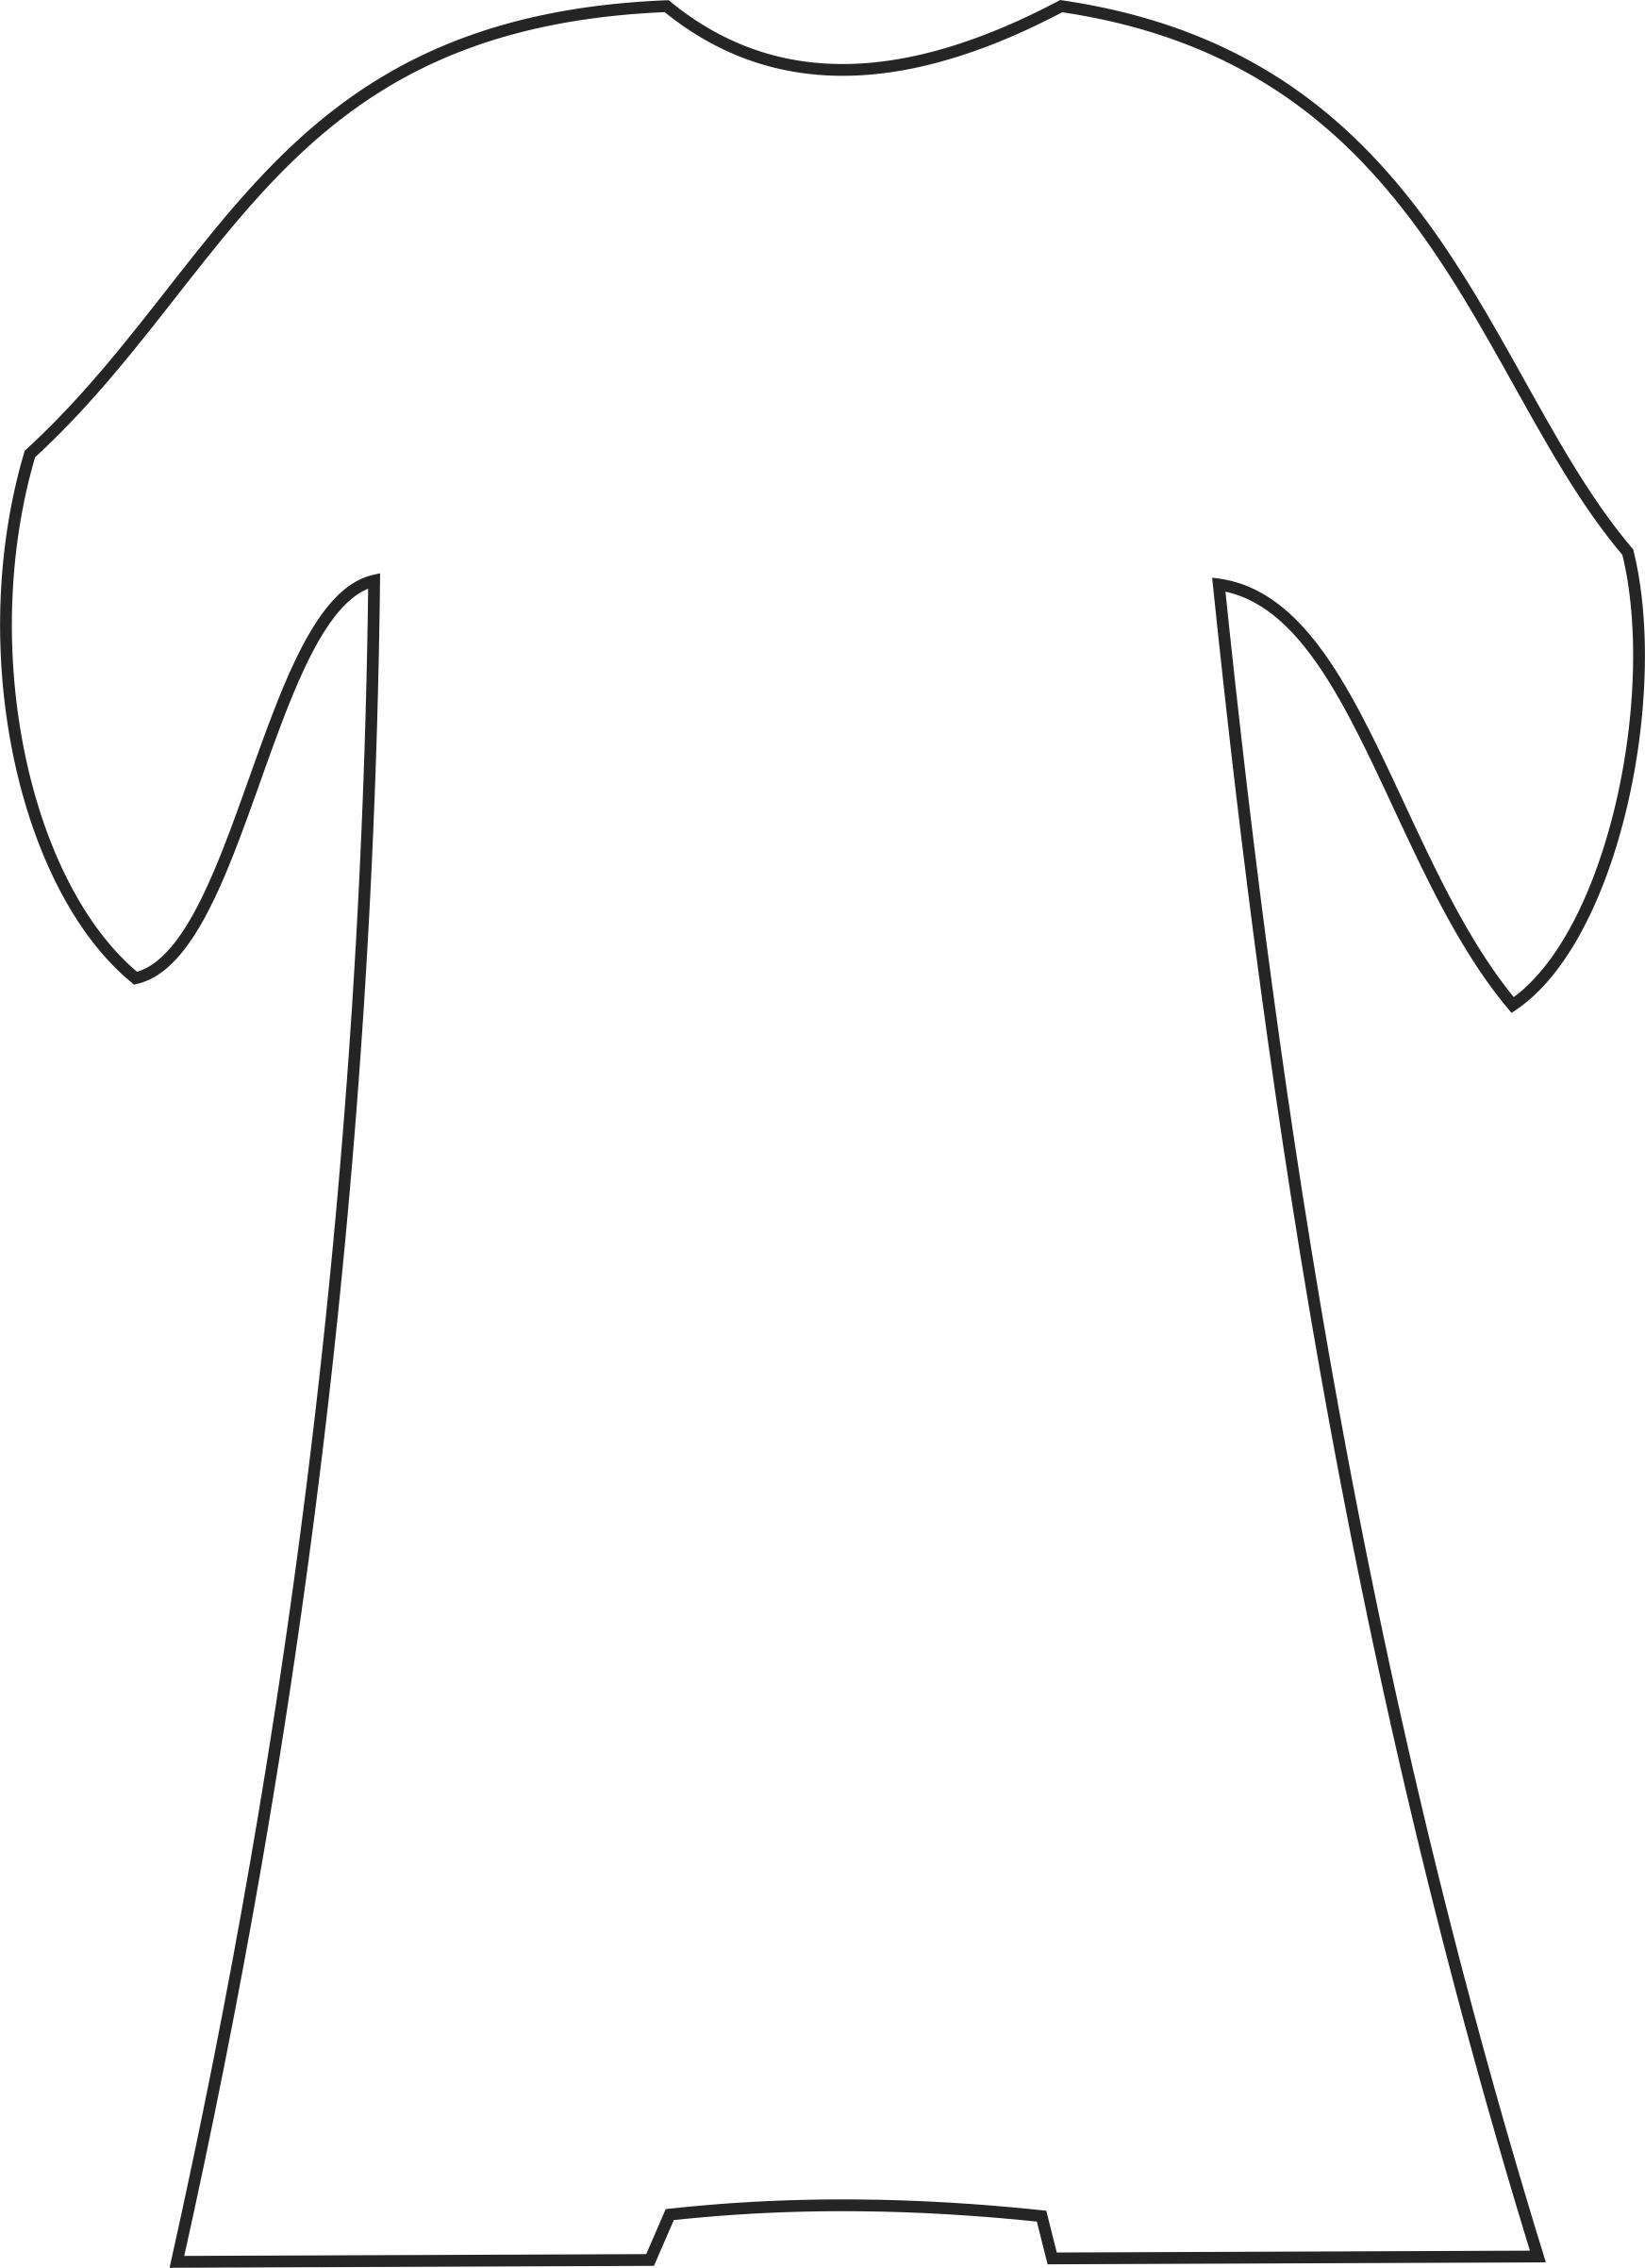 Robe coloring #7, Download drawings